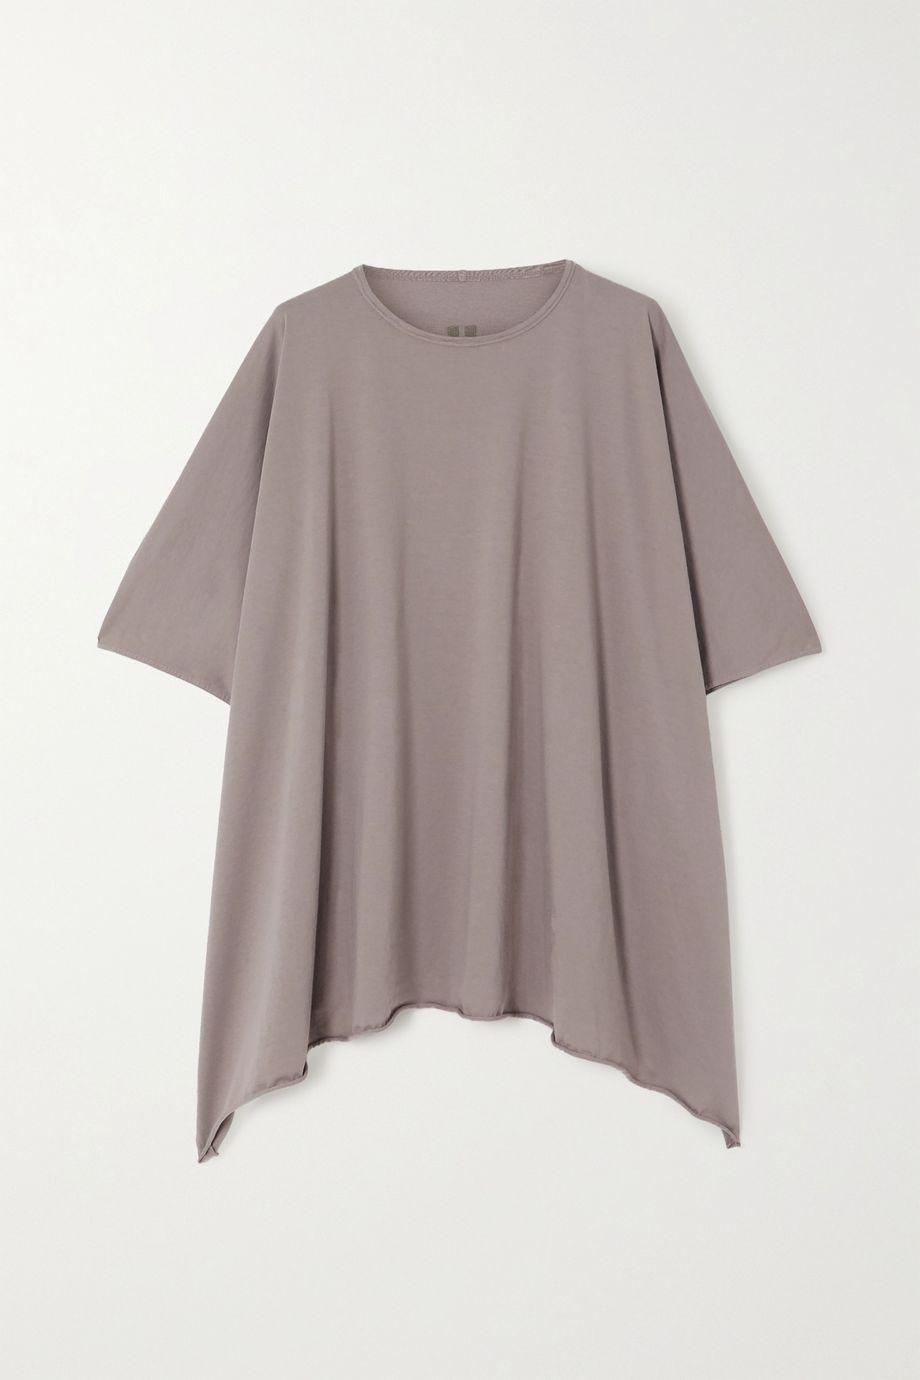 Rick Owens Minerva oversized cotton-jersey T-shirt